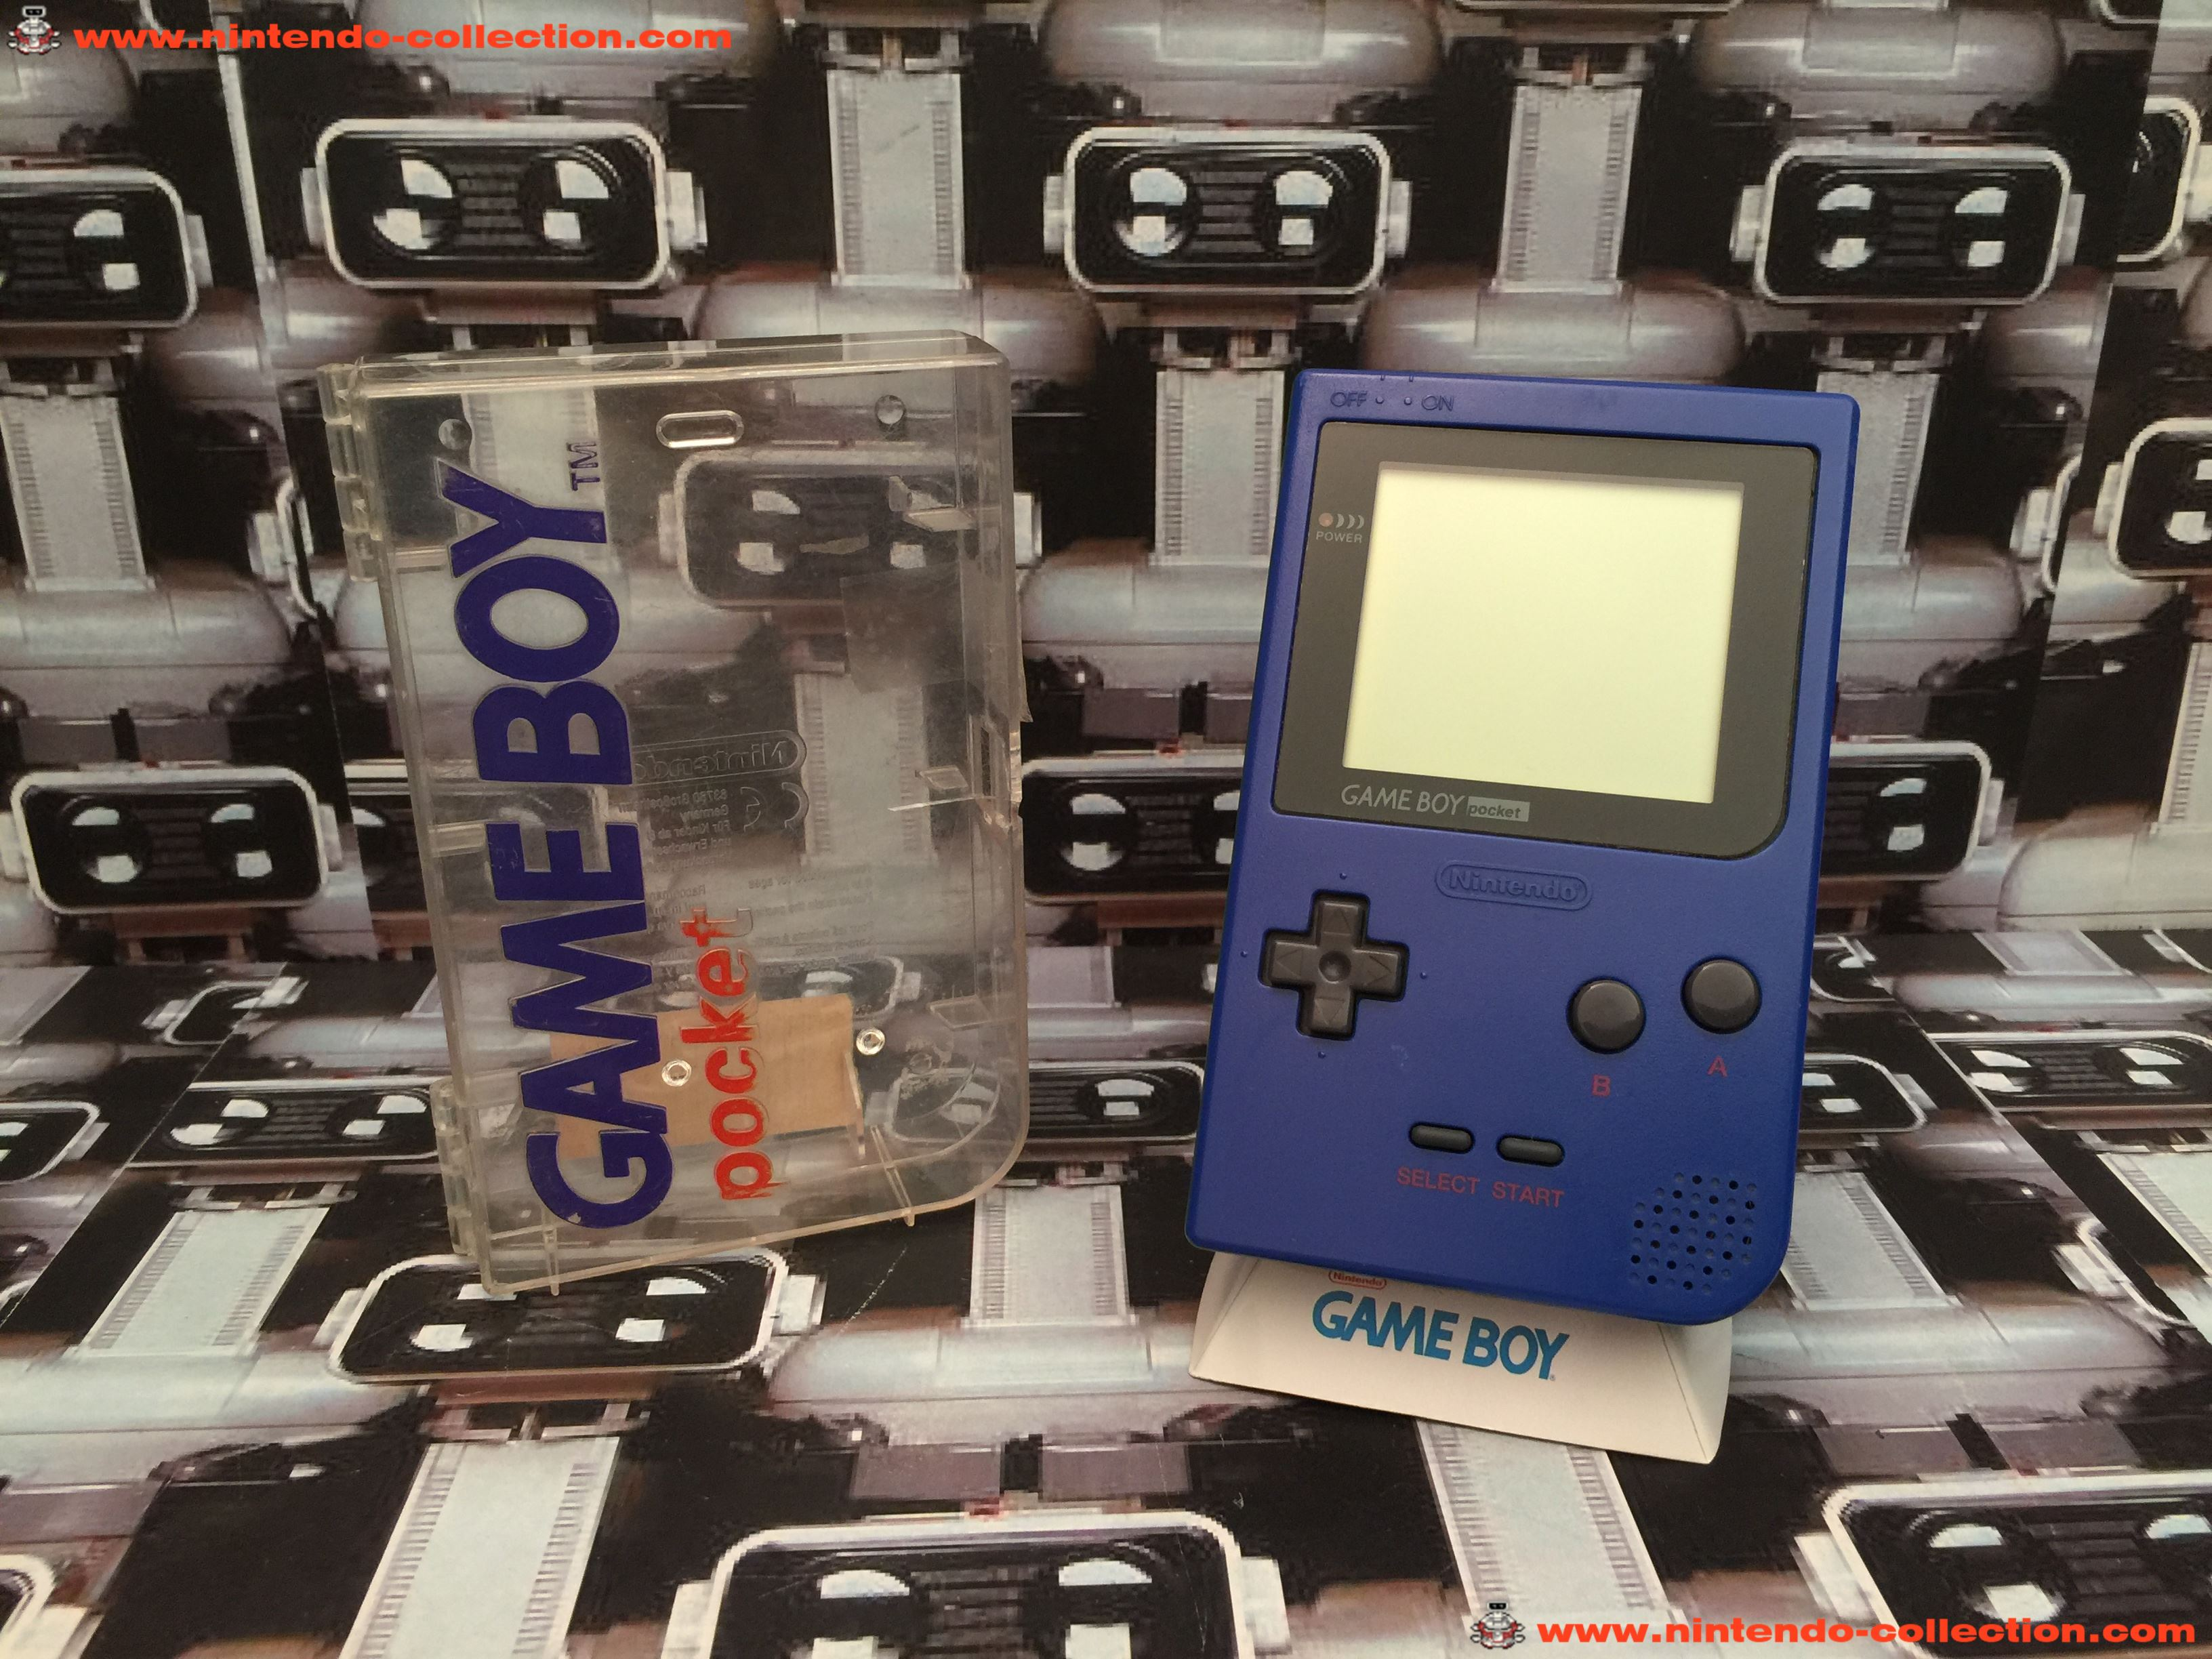 www.nintendo-collection.com - Gameboy Pocket GB Blue Bleu Crystal Box - 01